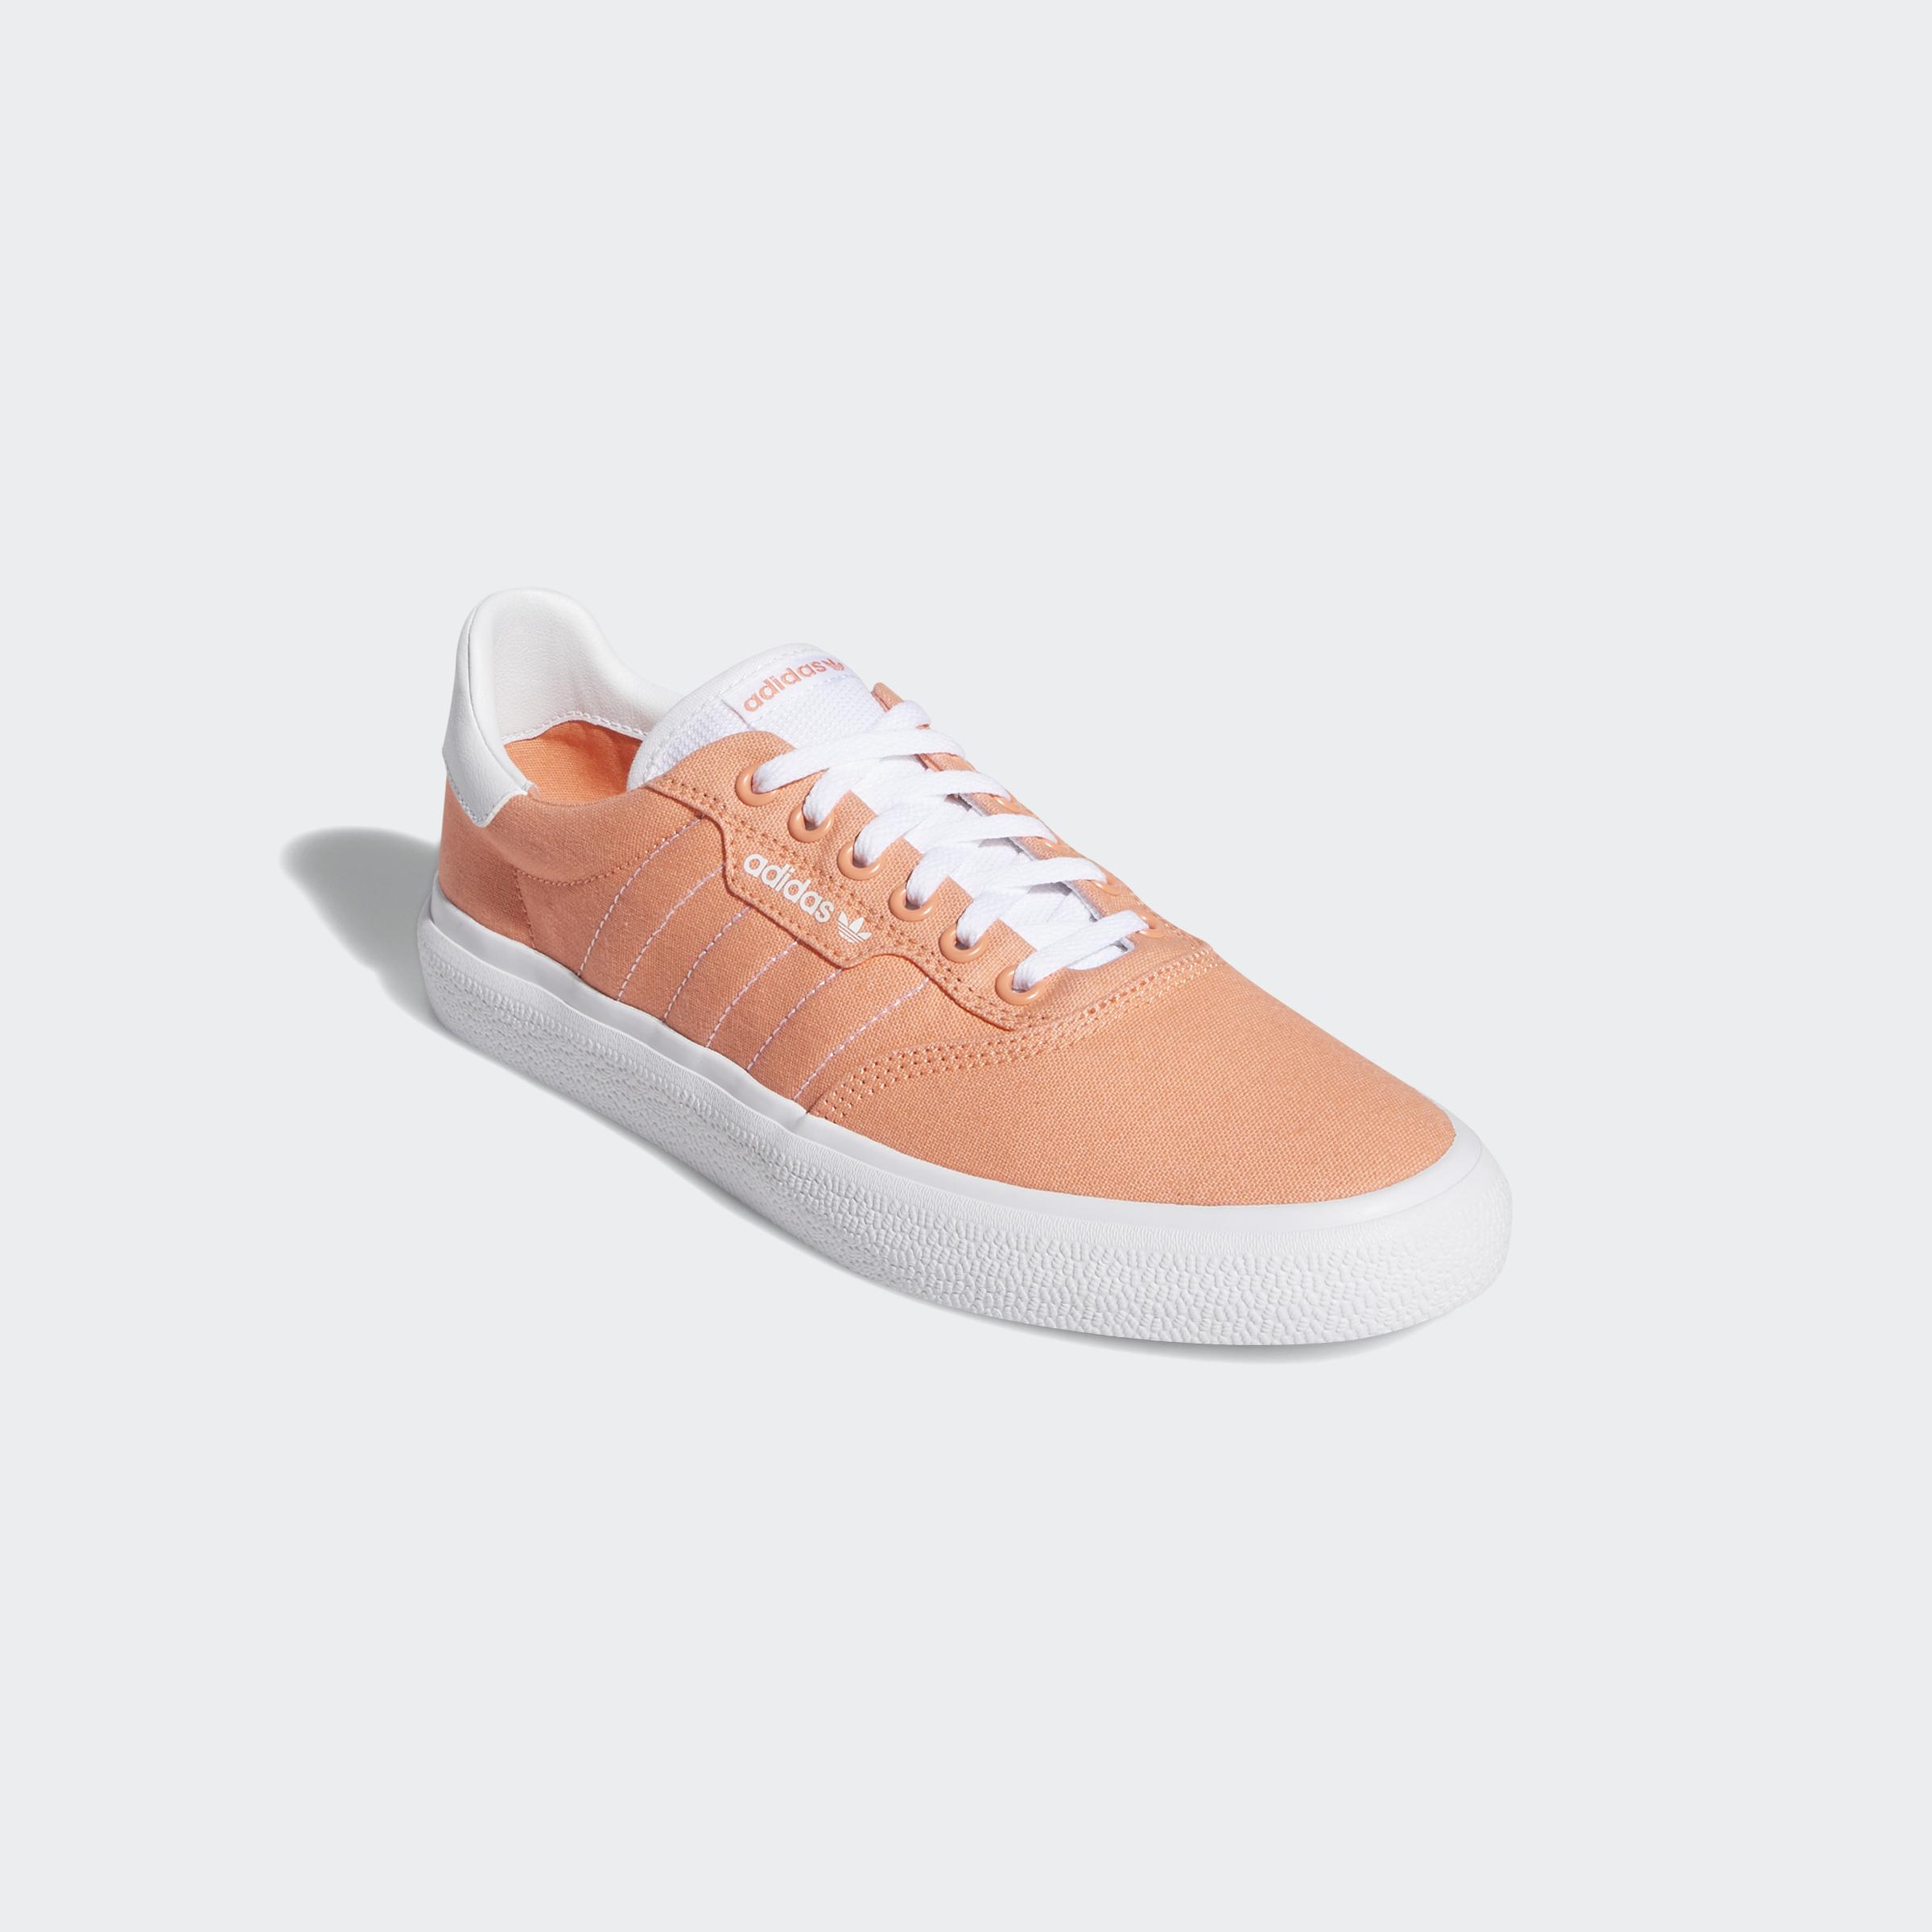 adidas-3MC-Shoes-Athletic-amp-Sneakers thumbnail 27